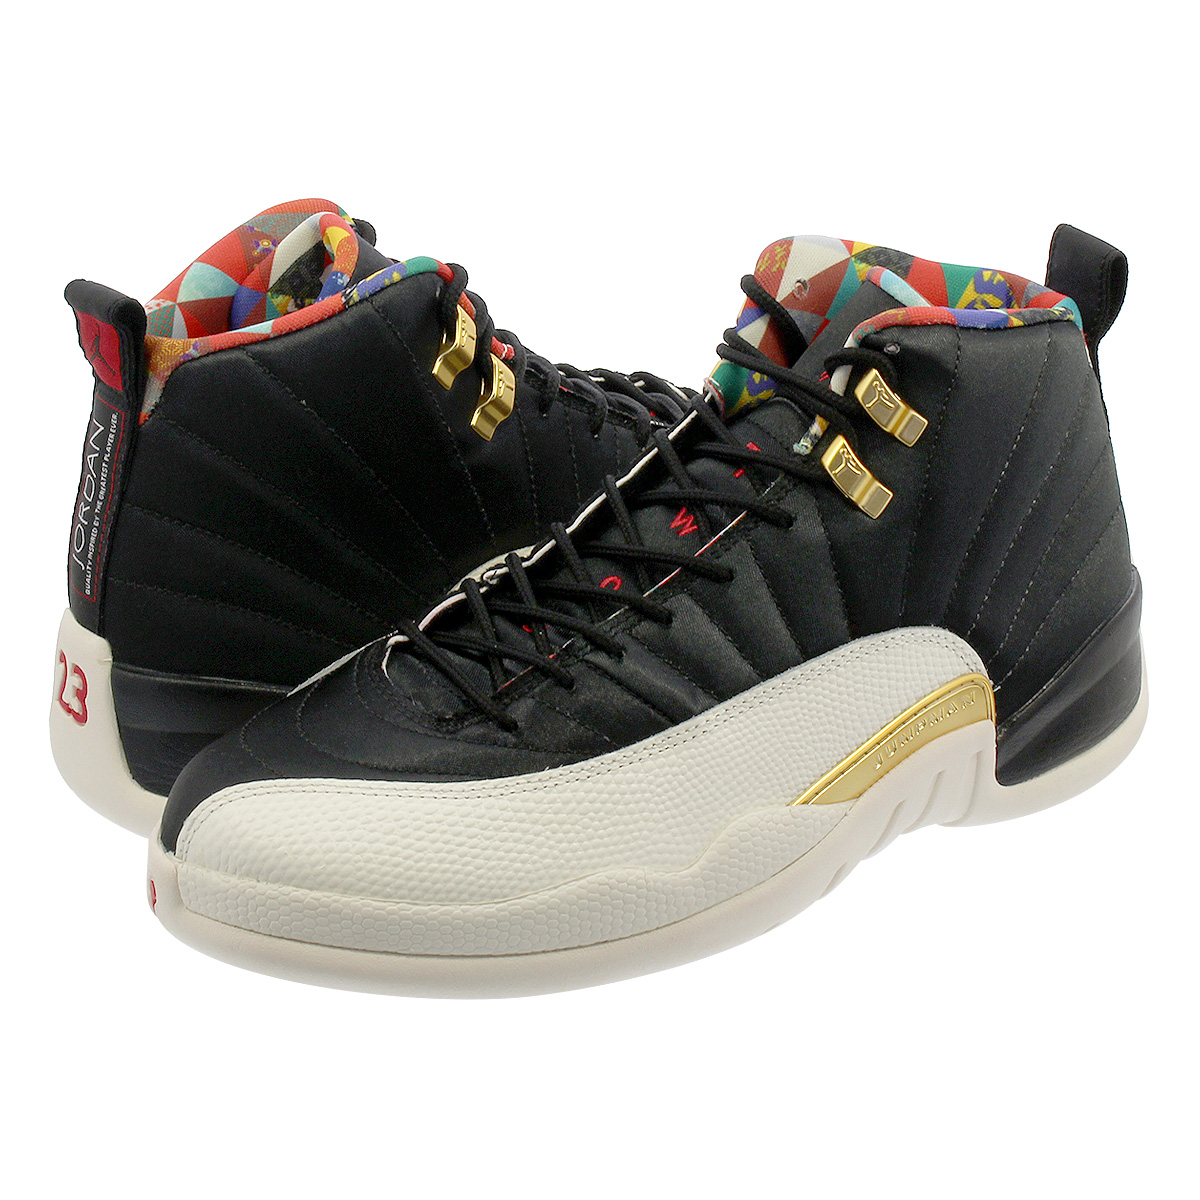 NIKE AIR JORDAN 12 RETRO Nike Air Jordan 12 nostalgic BLACK TRUE RED SAIL METALLIC  GOLD ci2977-006 e78c79dd753